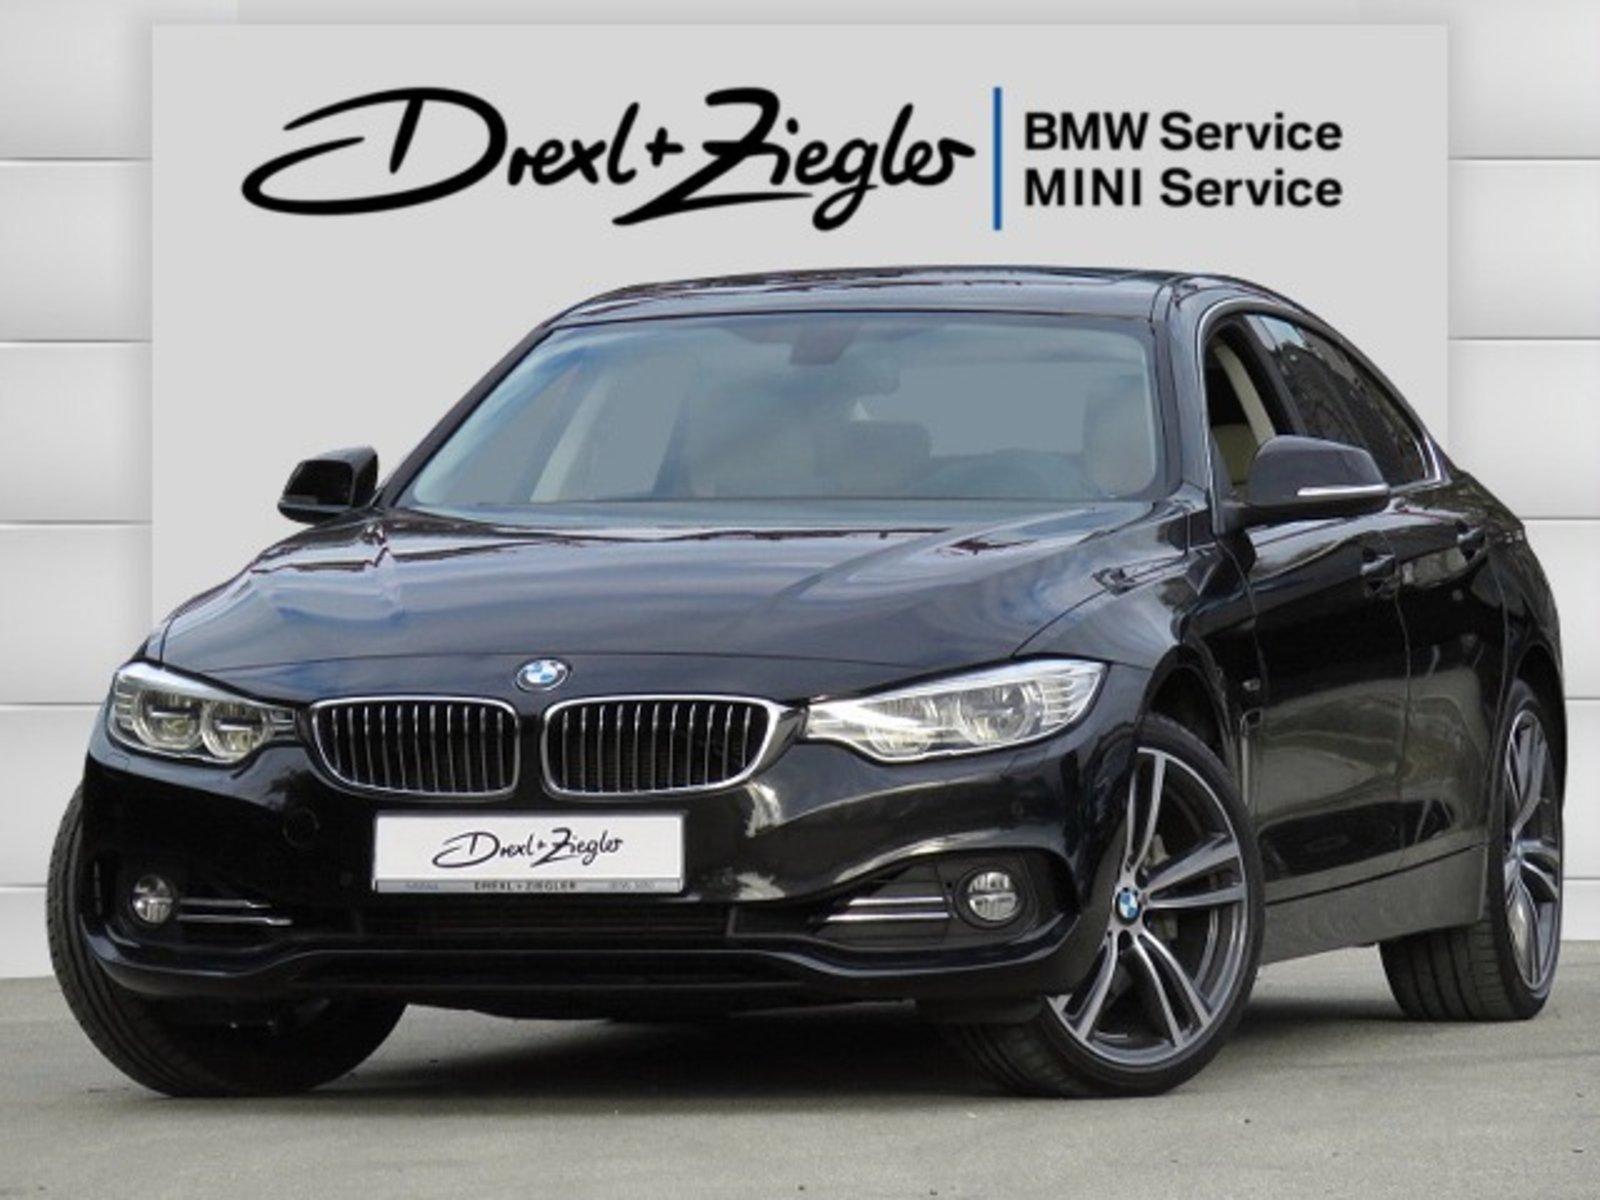 BMW 435d xDrive Gran Coupe Navi HUD DAB HiFi Alu19, Jahr 2014, Diesel